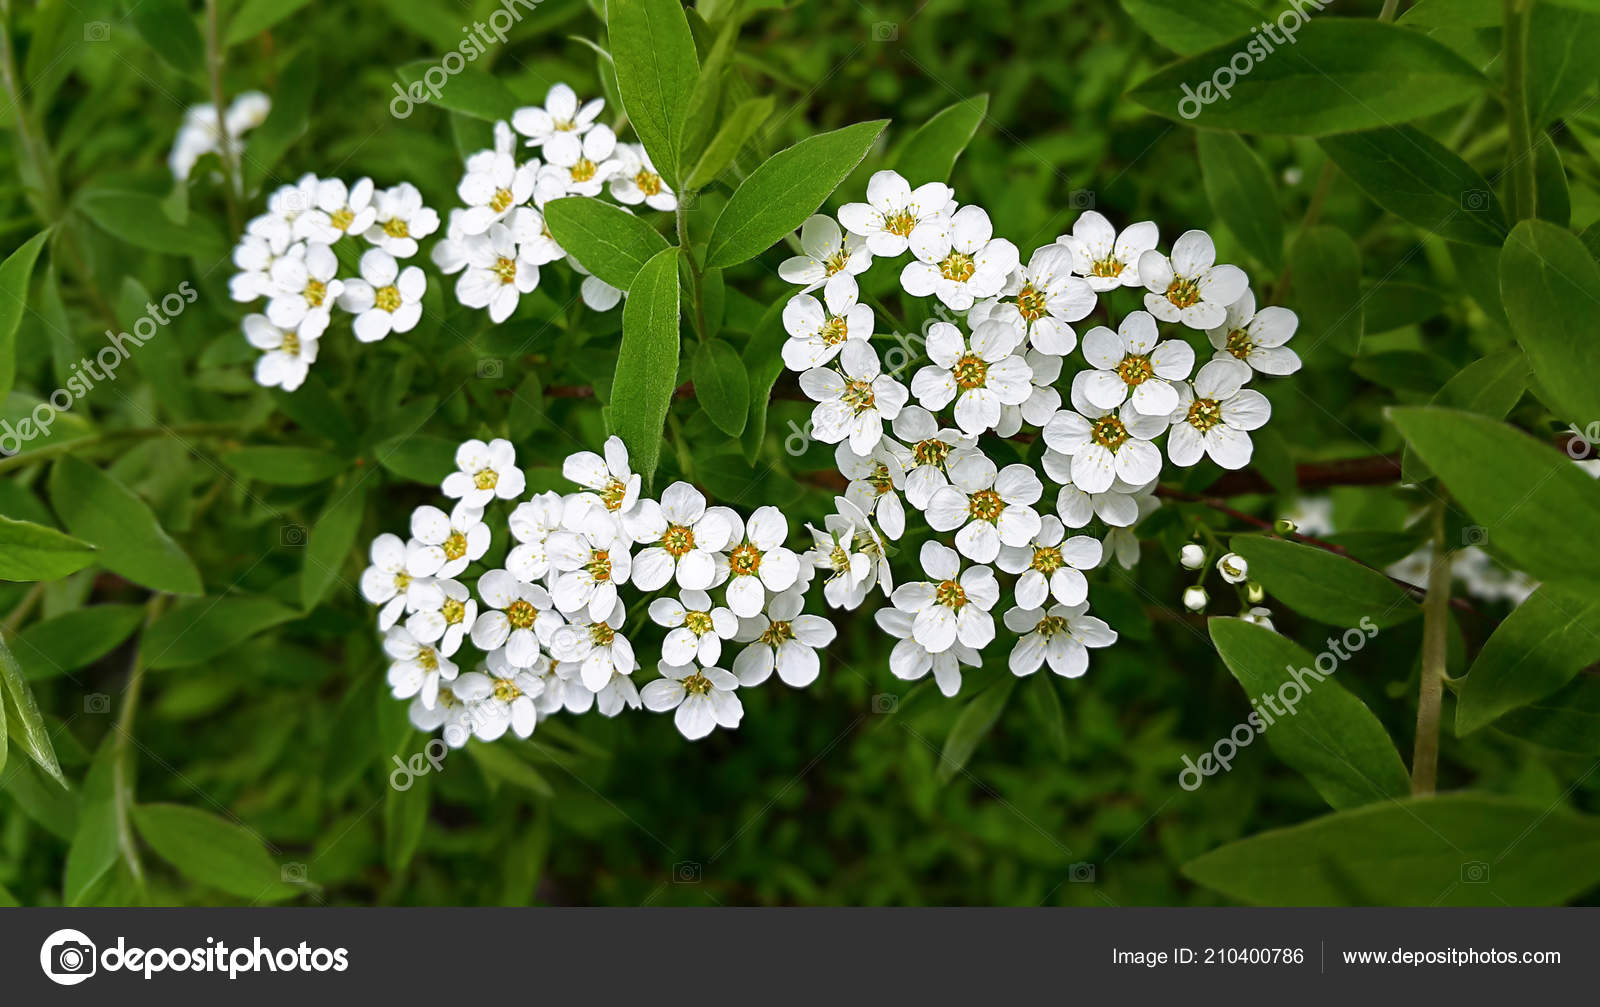 Spring flowering shrub white flowers stock photo dink101 210400786 spring flowering shrub white flowers stock photo mightylinksfo